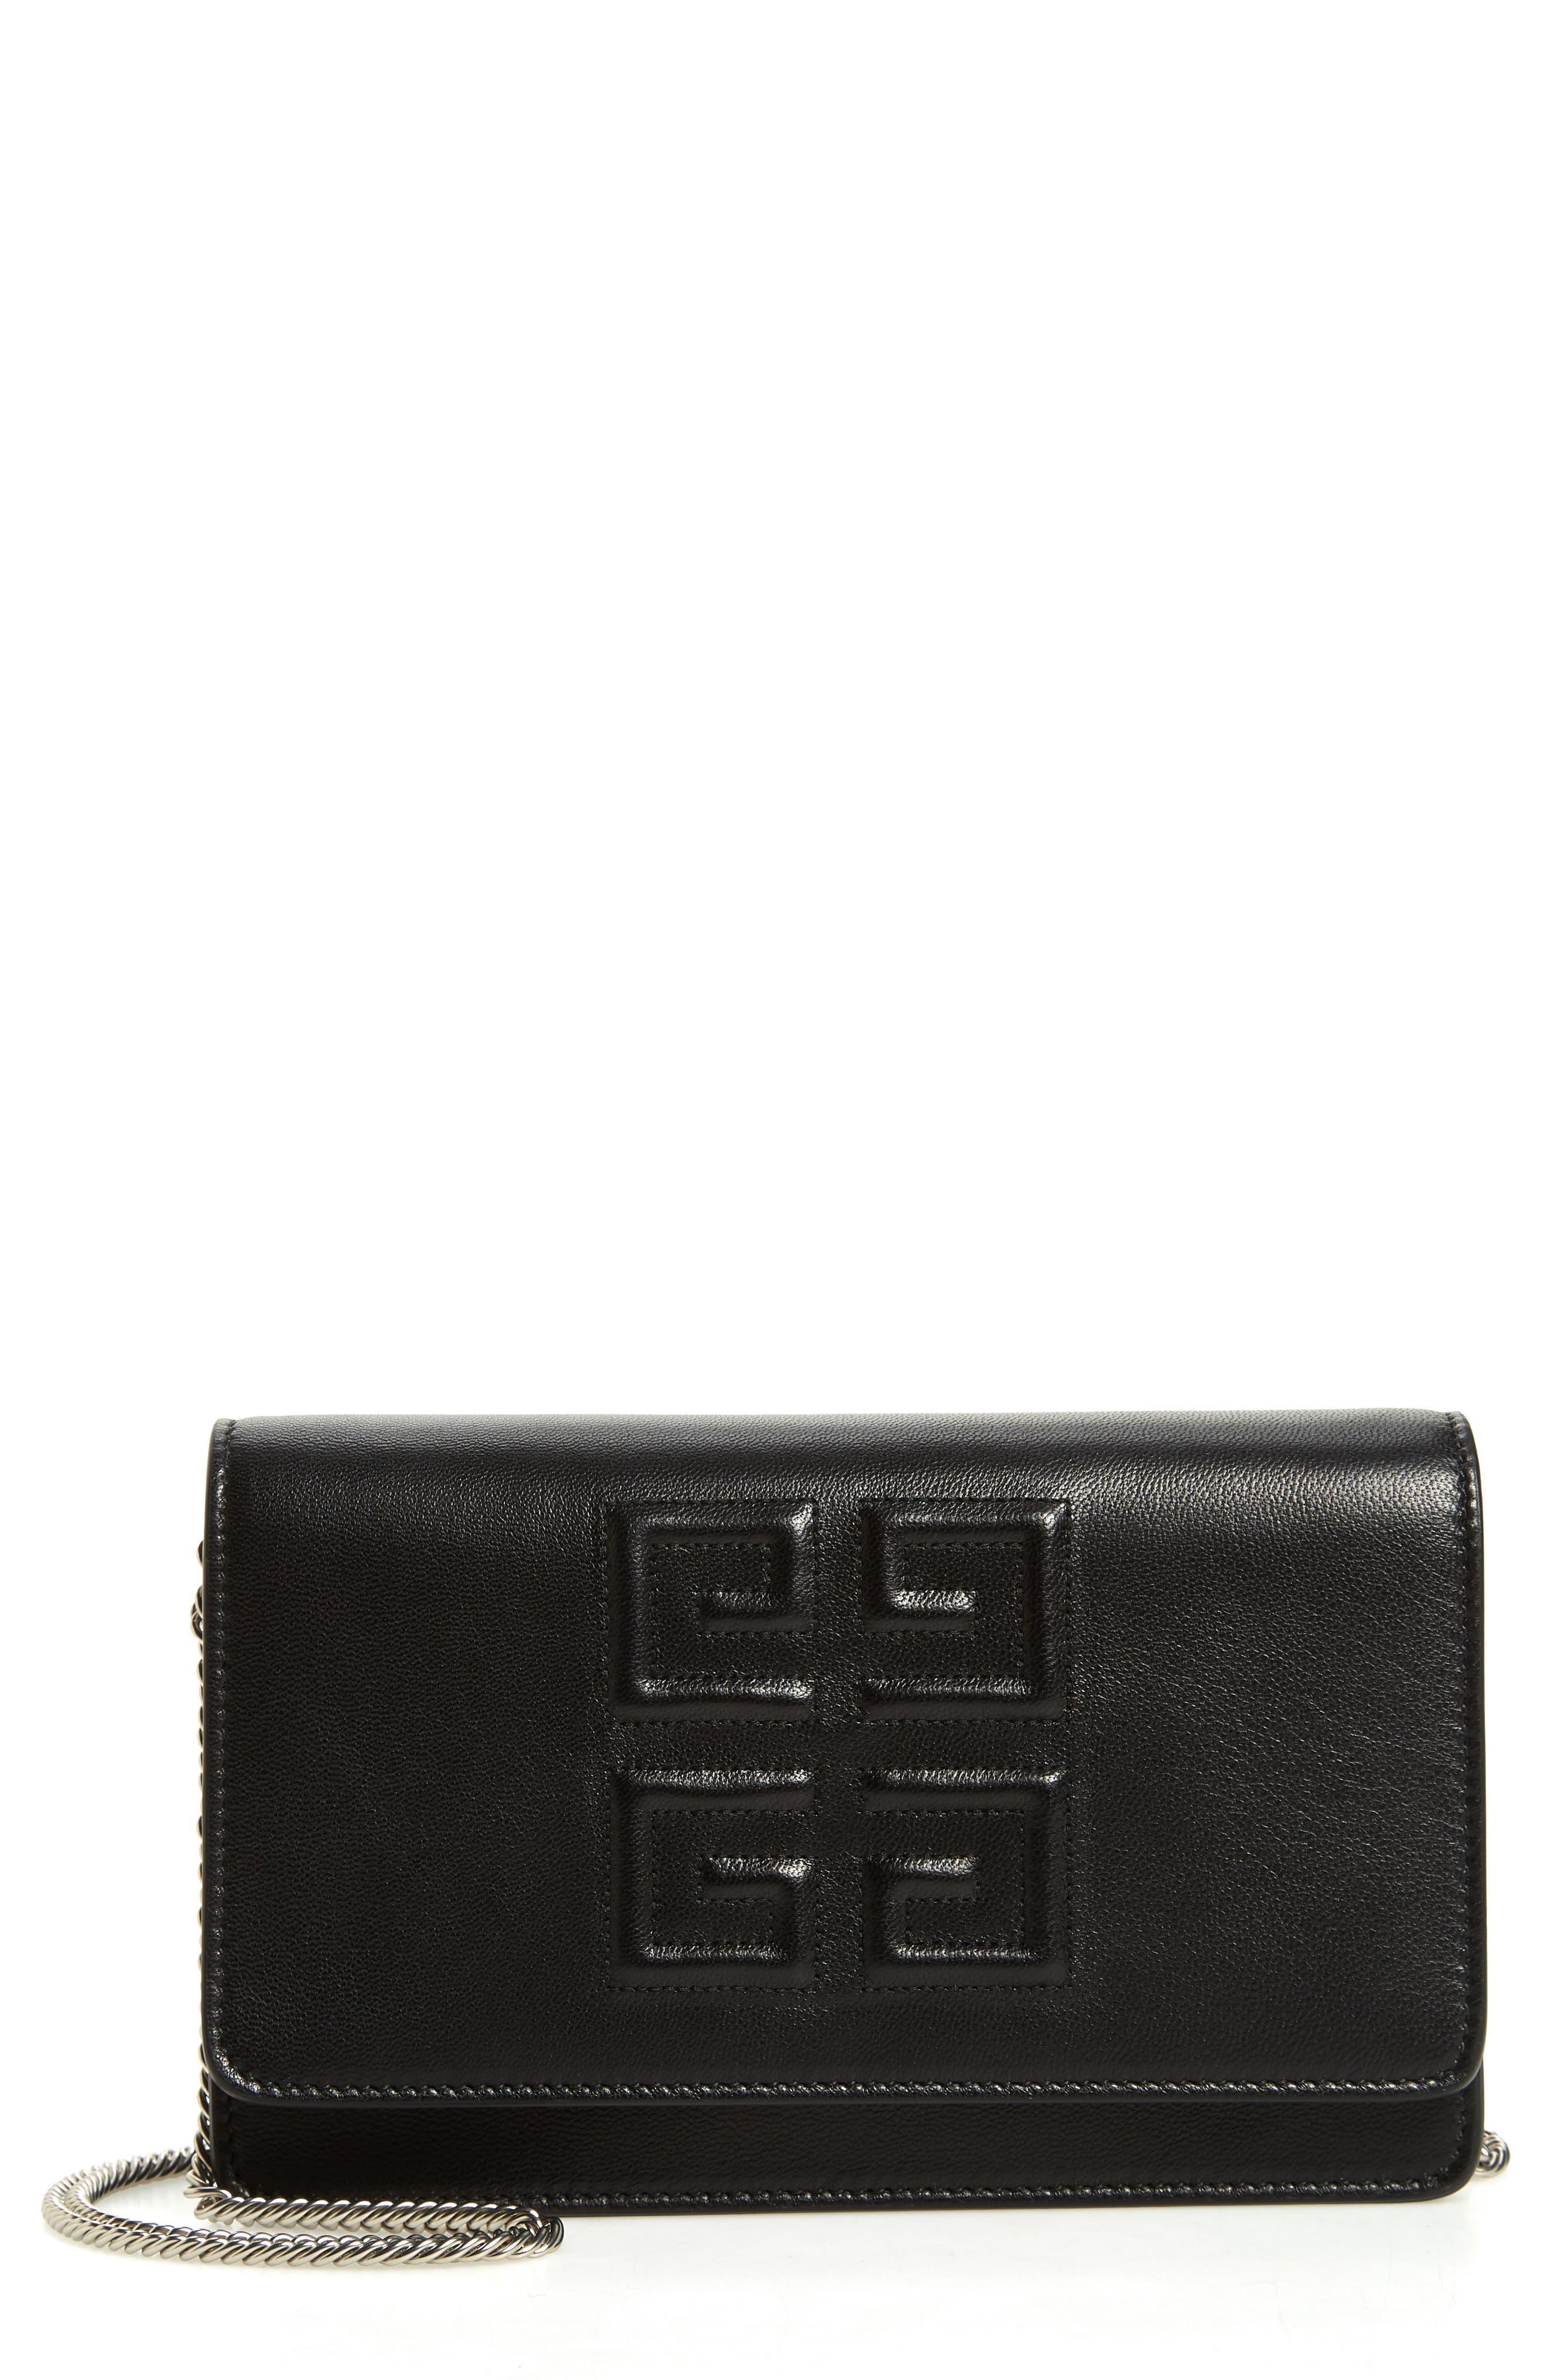 Emblem Lambskin Leather Crossbody Bag,                             Main thumbnail 1, color,                             BLACK